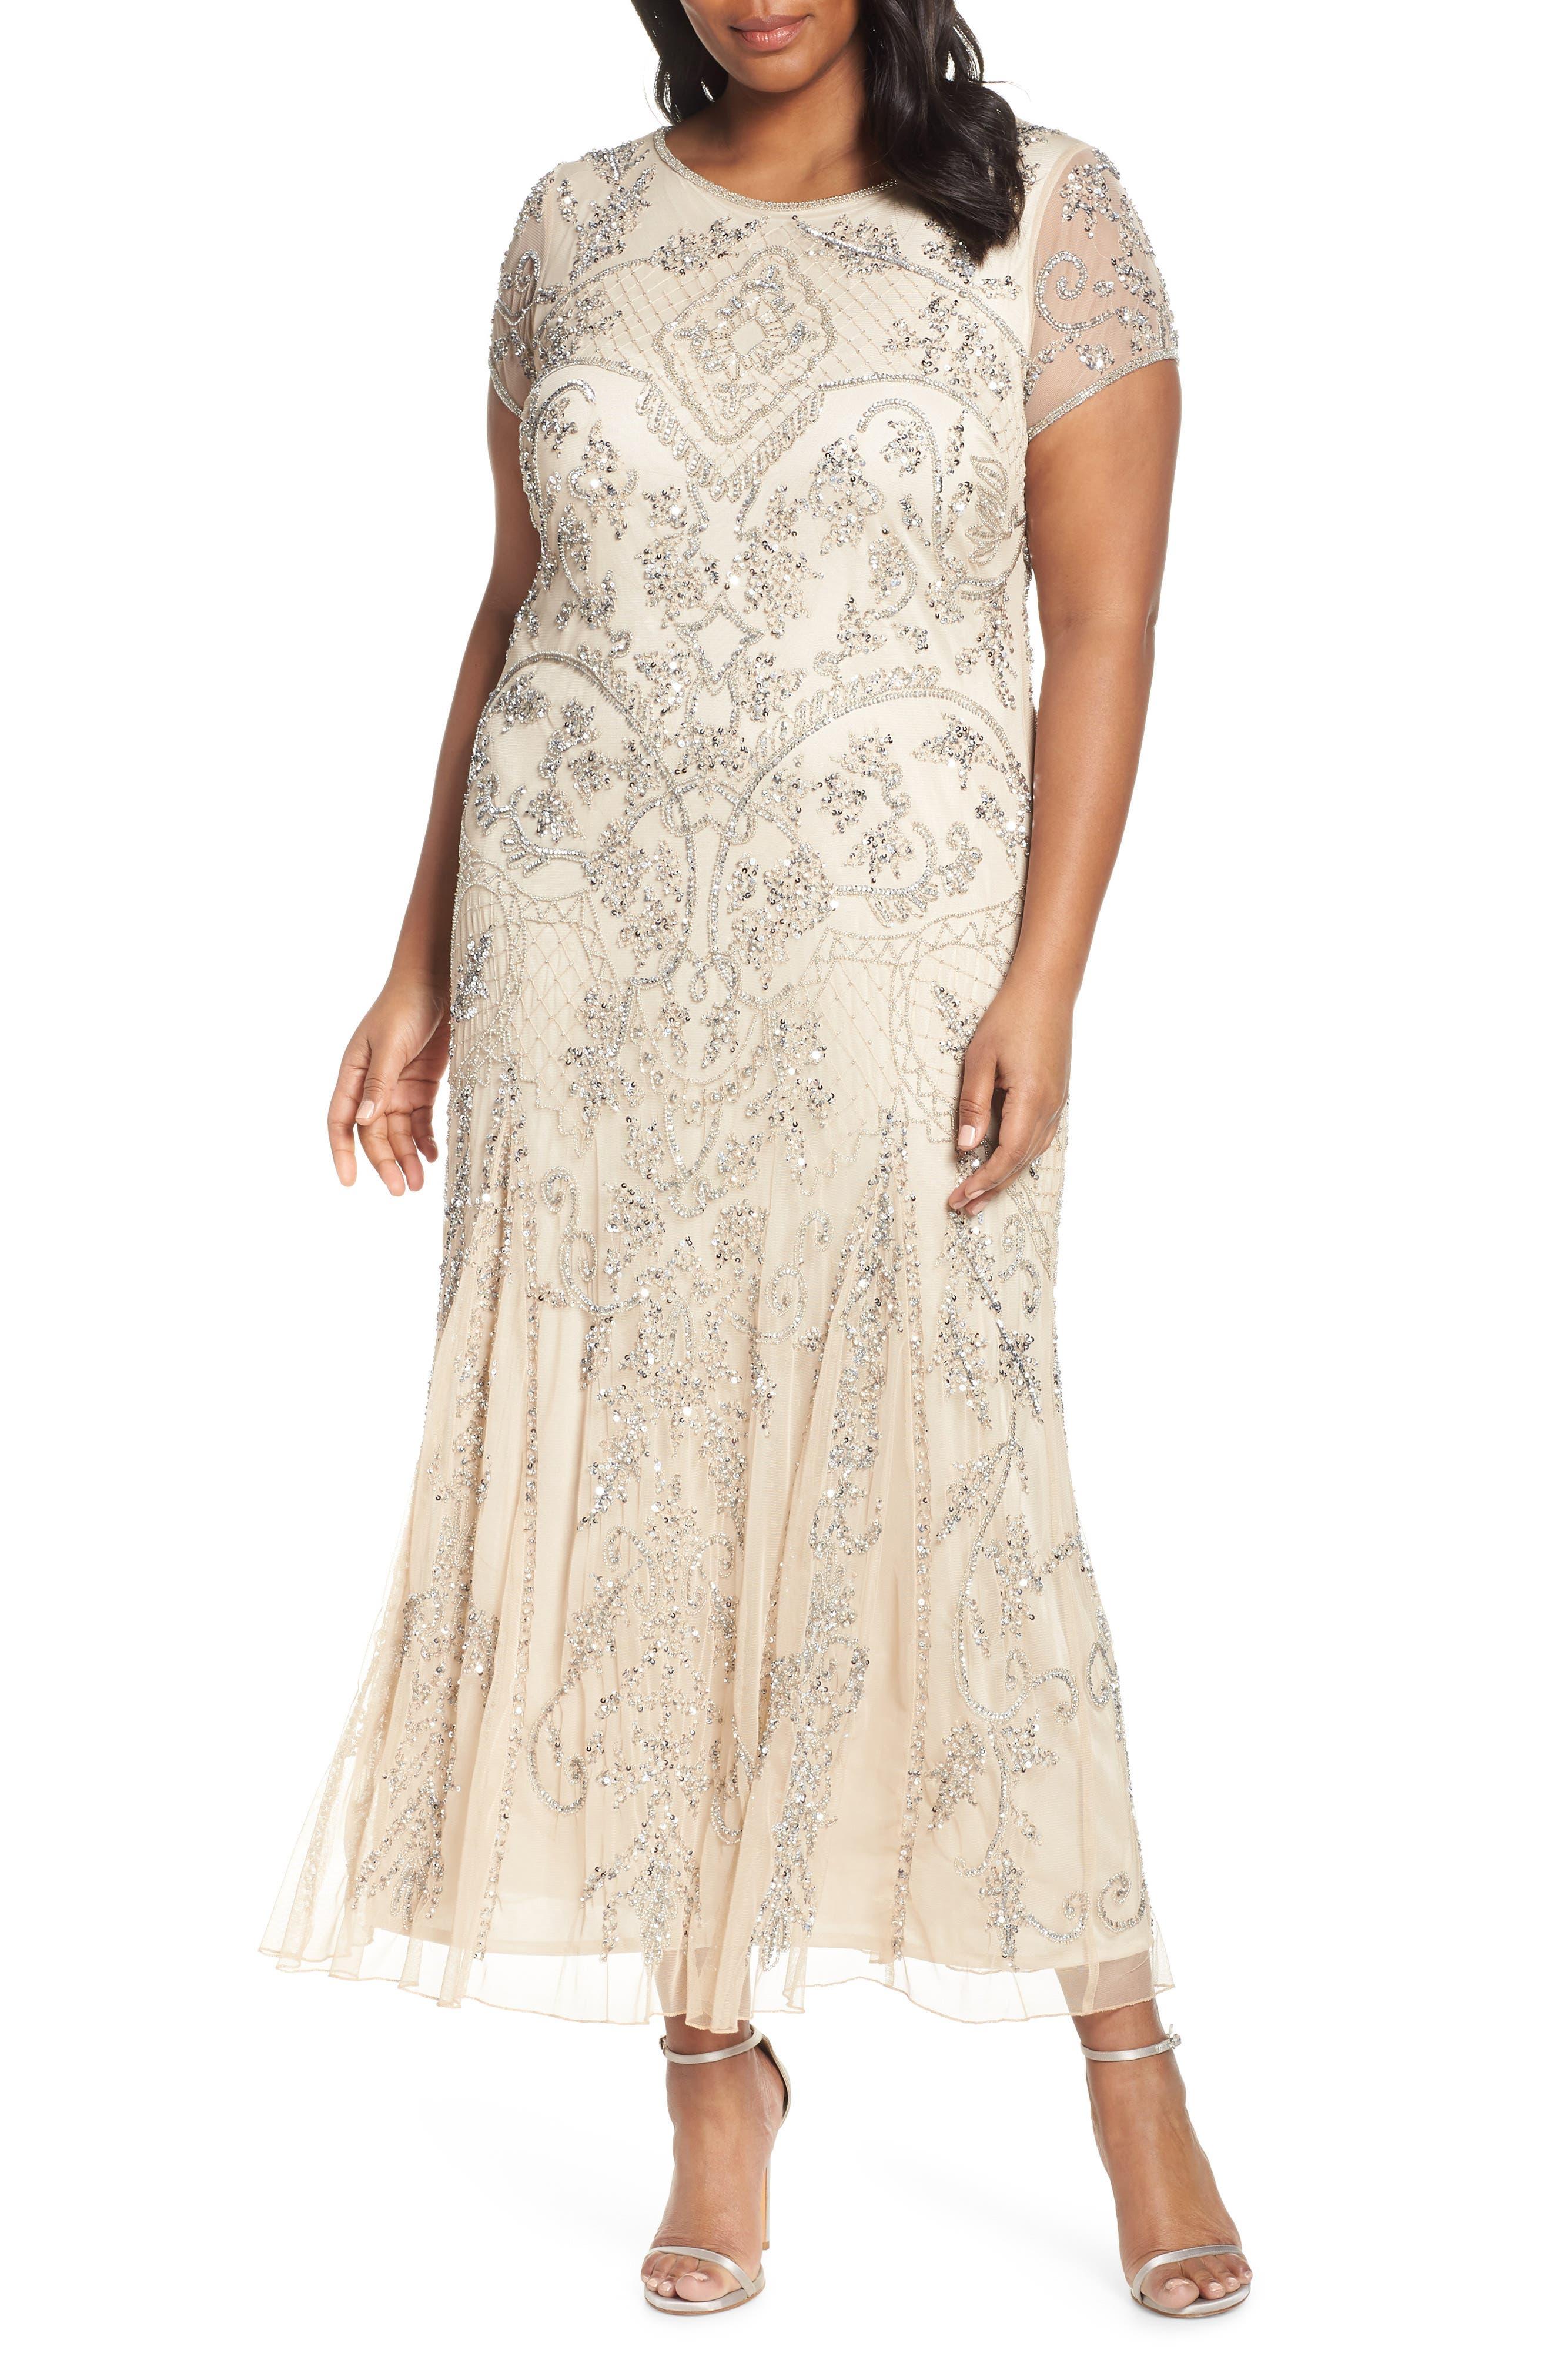 7b0e1afc0 Plus-Size Dresses